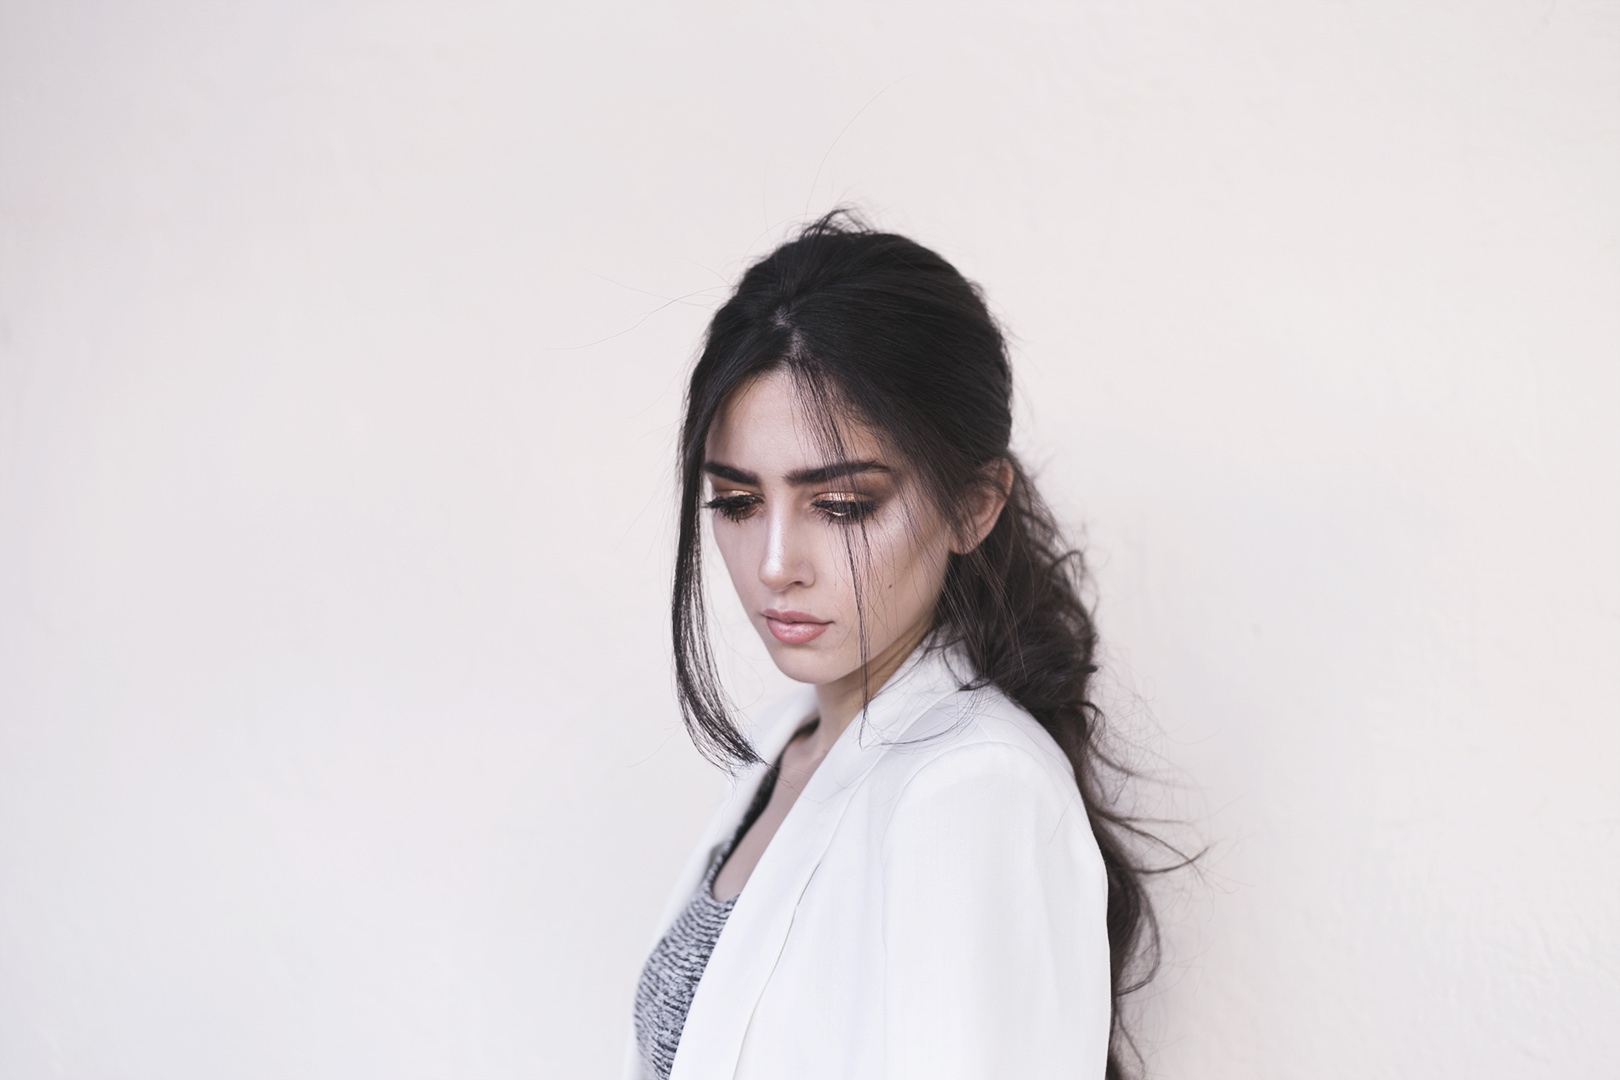 Portrait Photography - Hanane TOUZANI ©